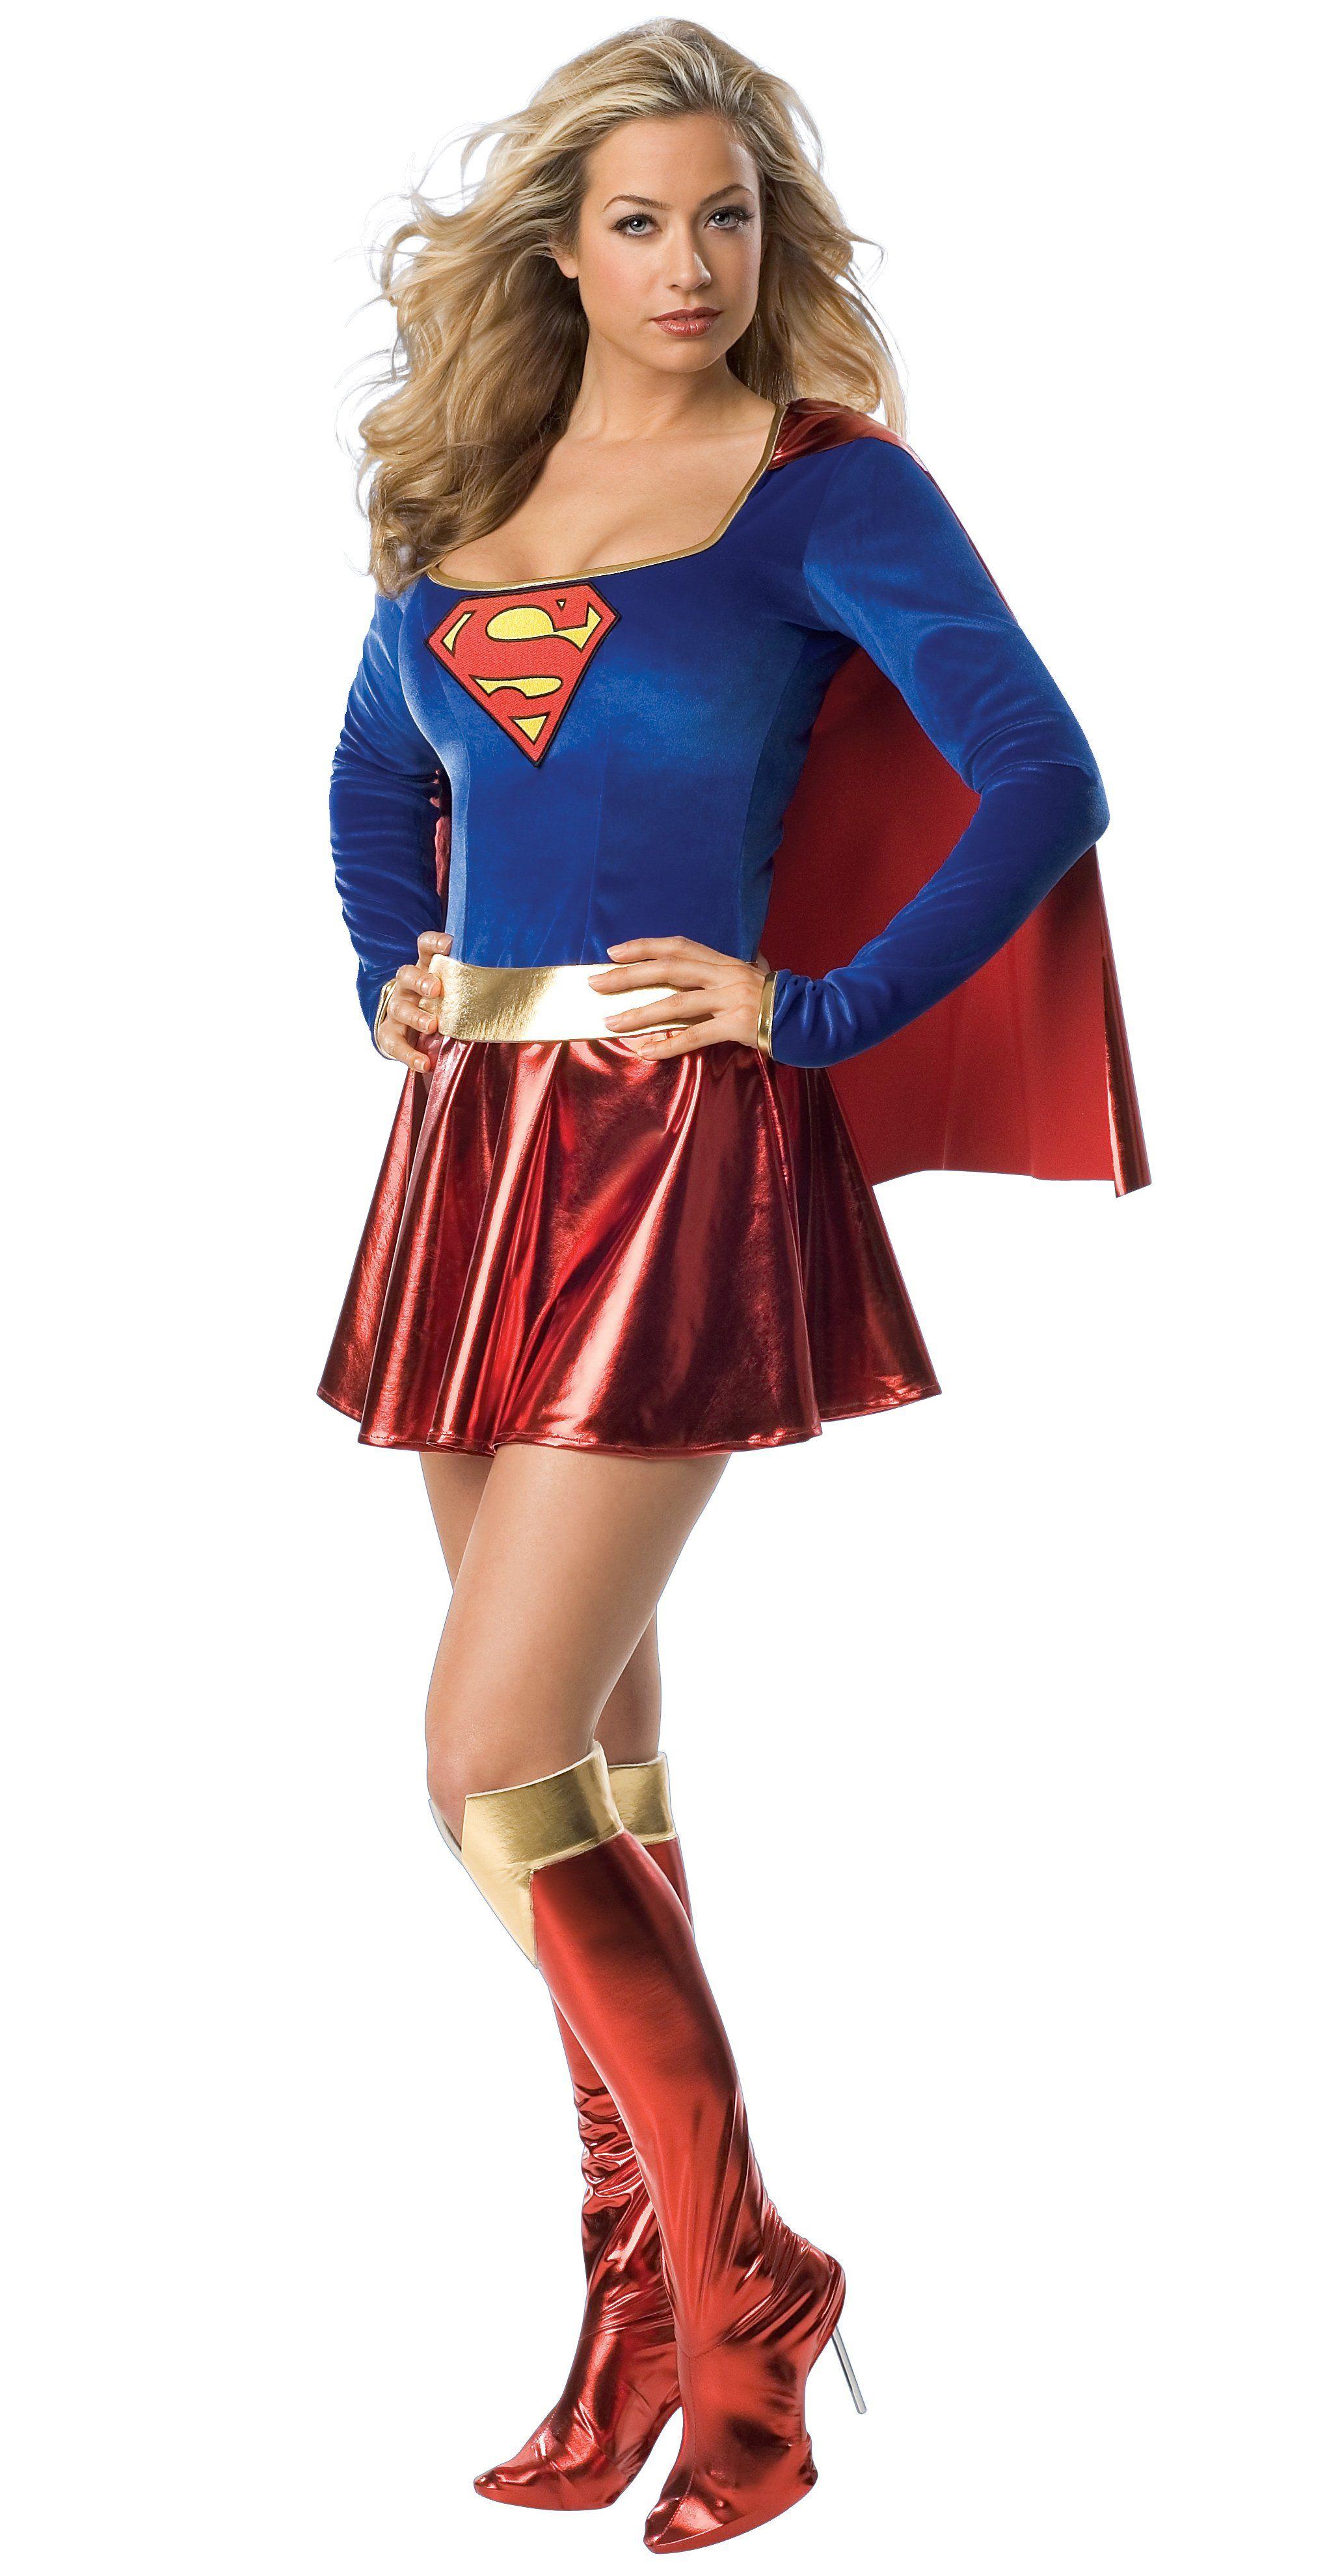 66183125c0 Supergirl Deluxe 1-Piece Adult Costume